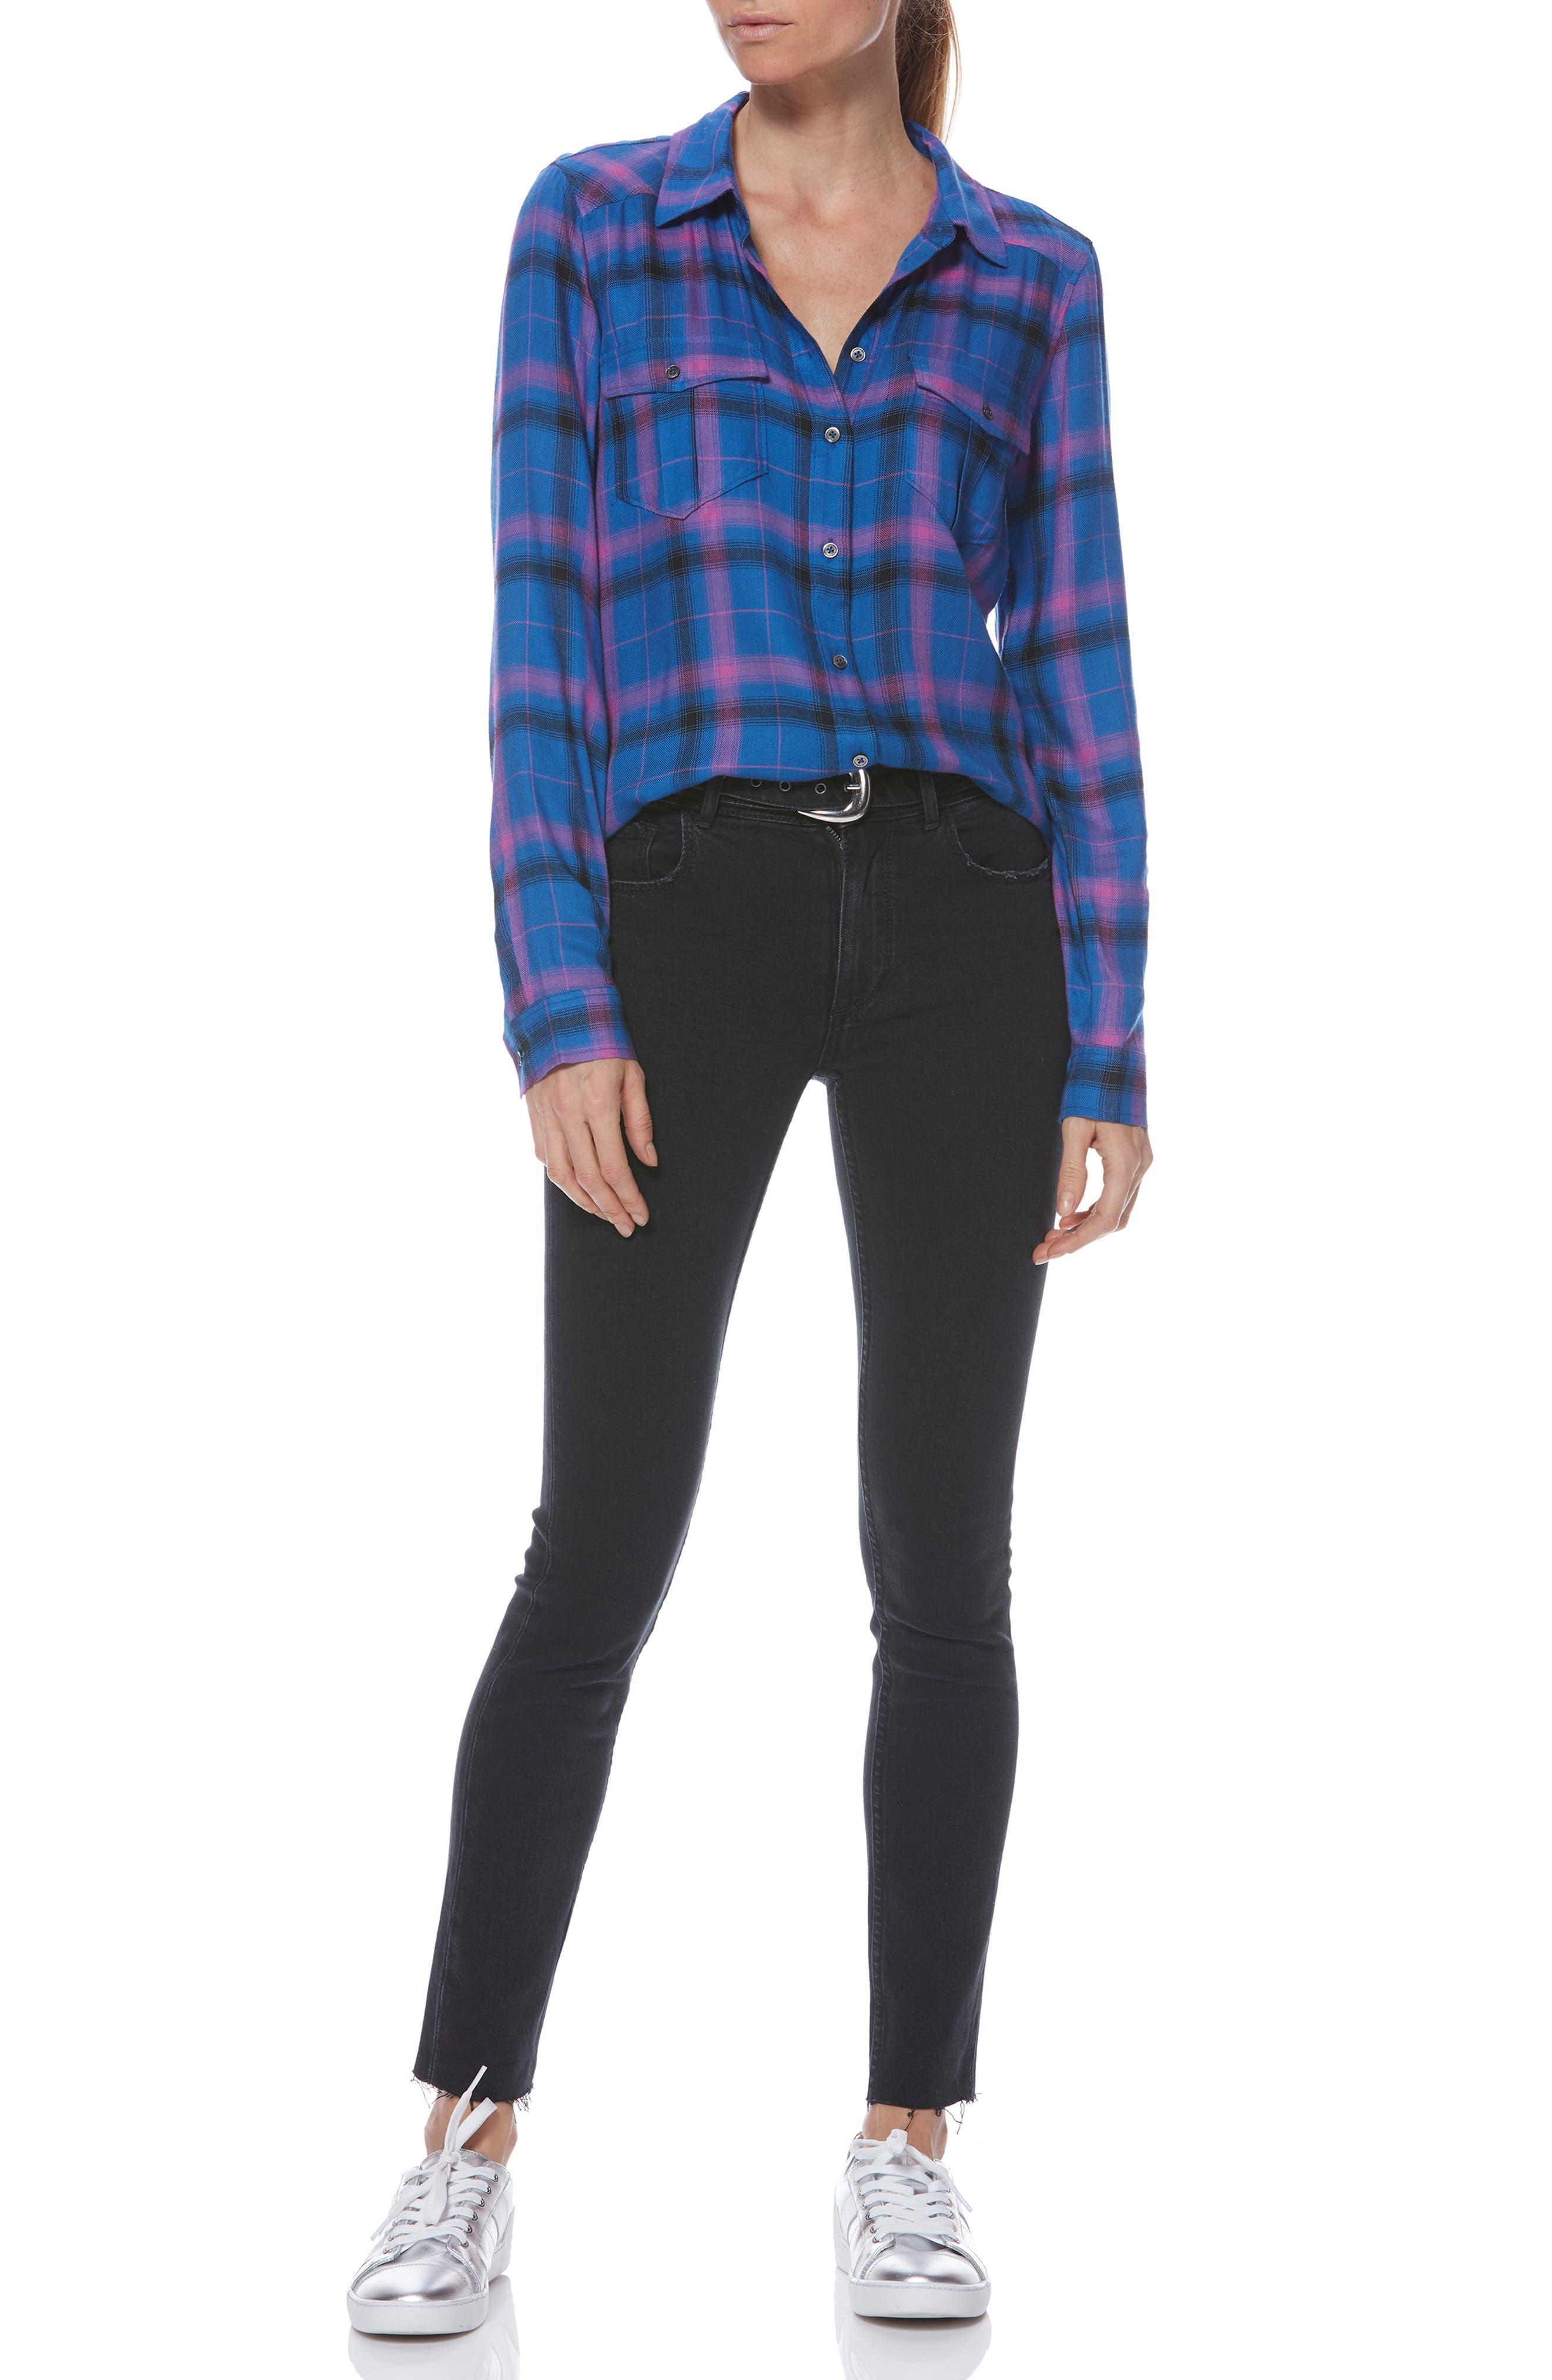 Mya Plaid Shirt,                             Alternate thumbnail 4, color,                             BRIGHT CROWN BLUE MULTI